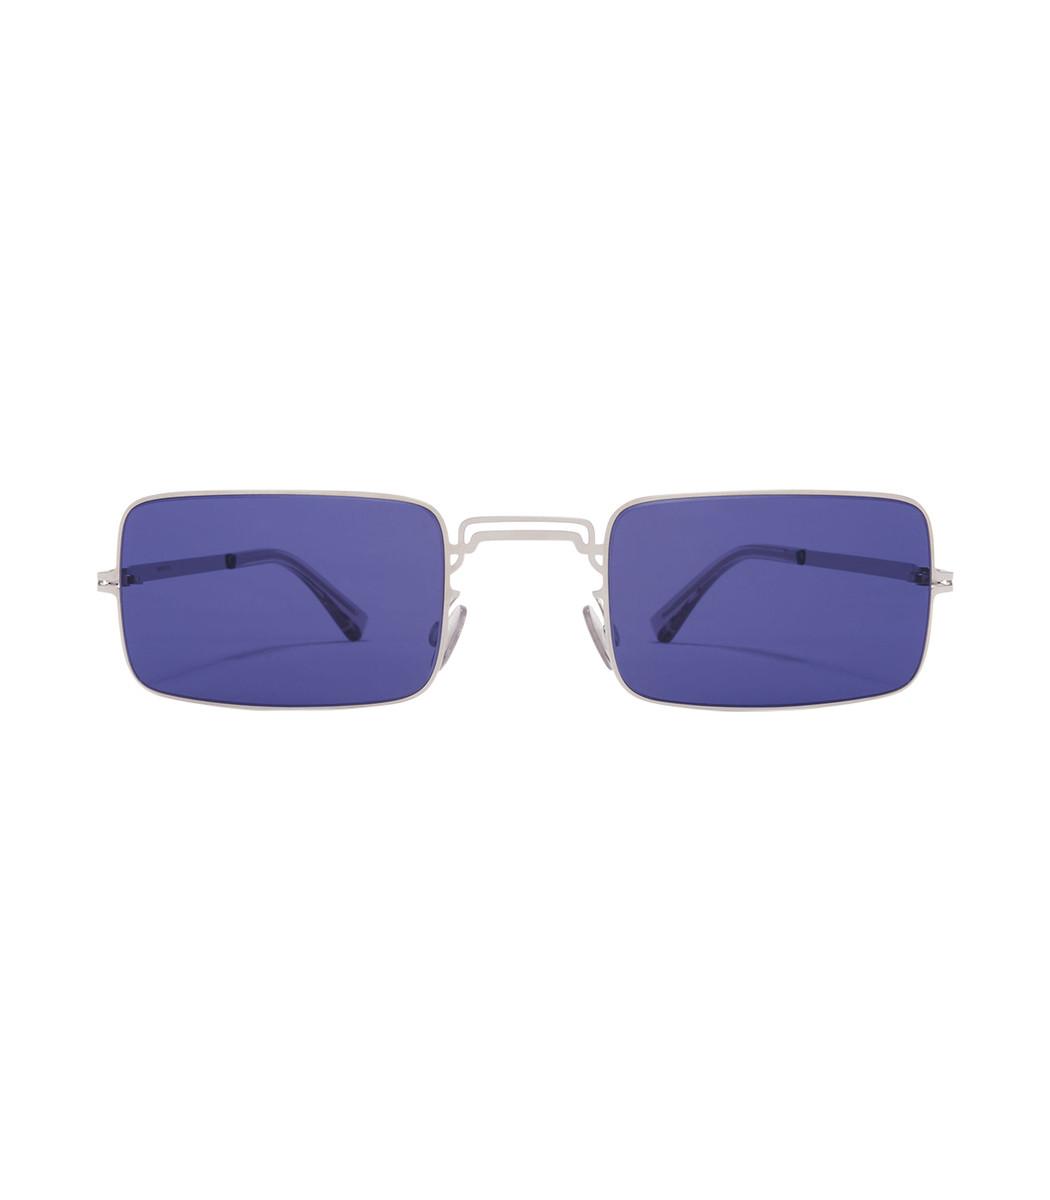 Mykita Blue Margiela Craft Square Sunglasses